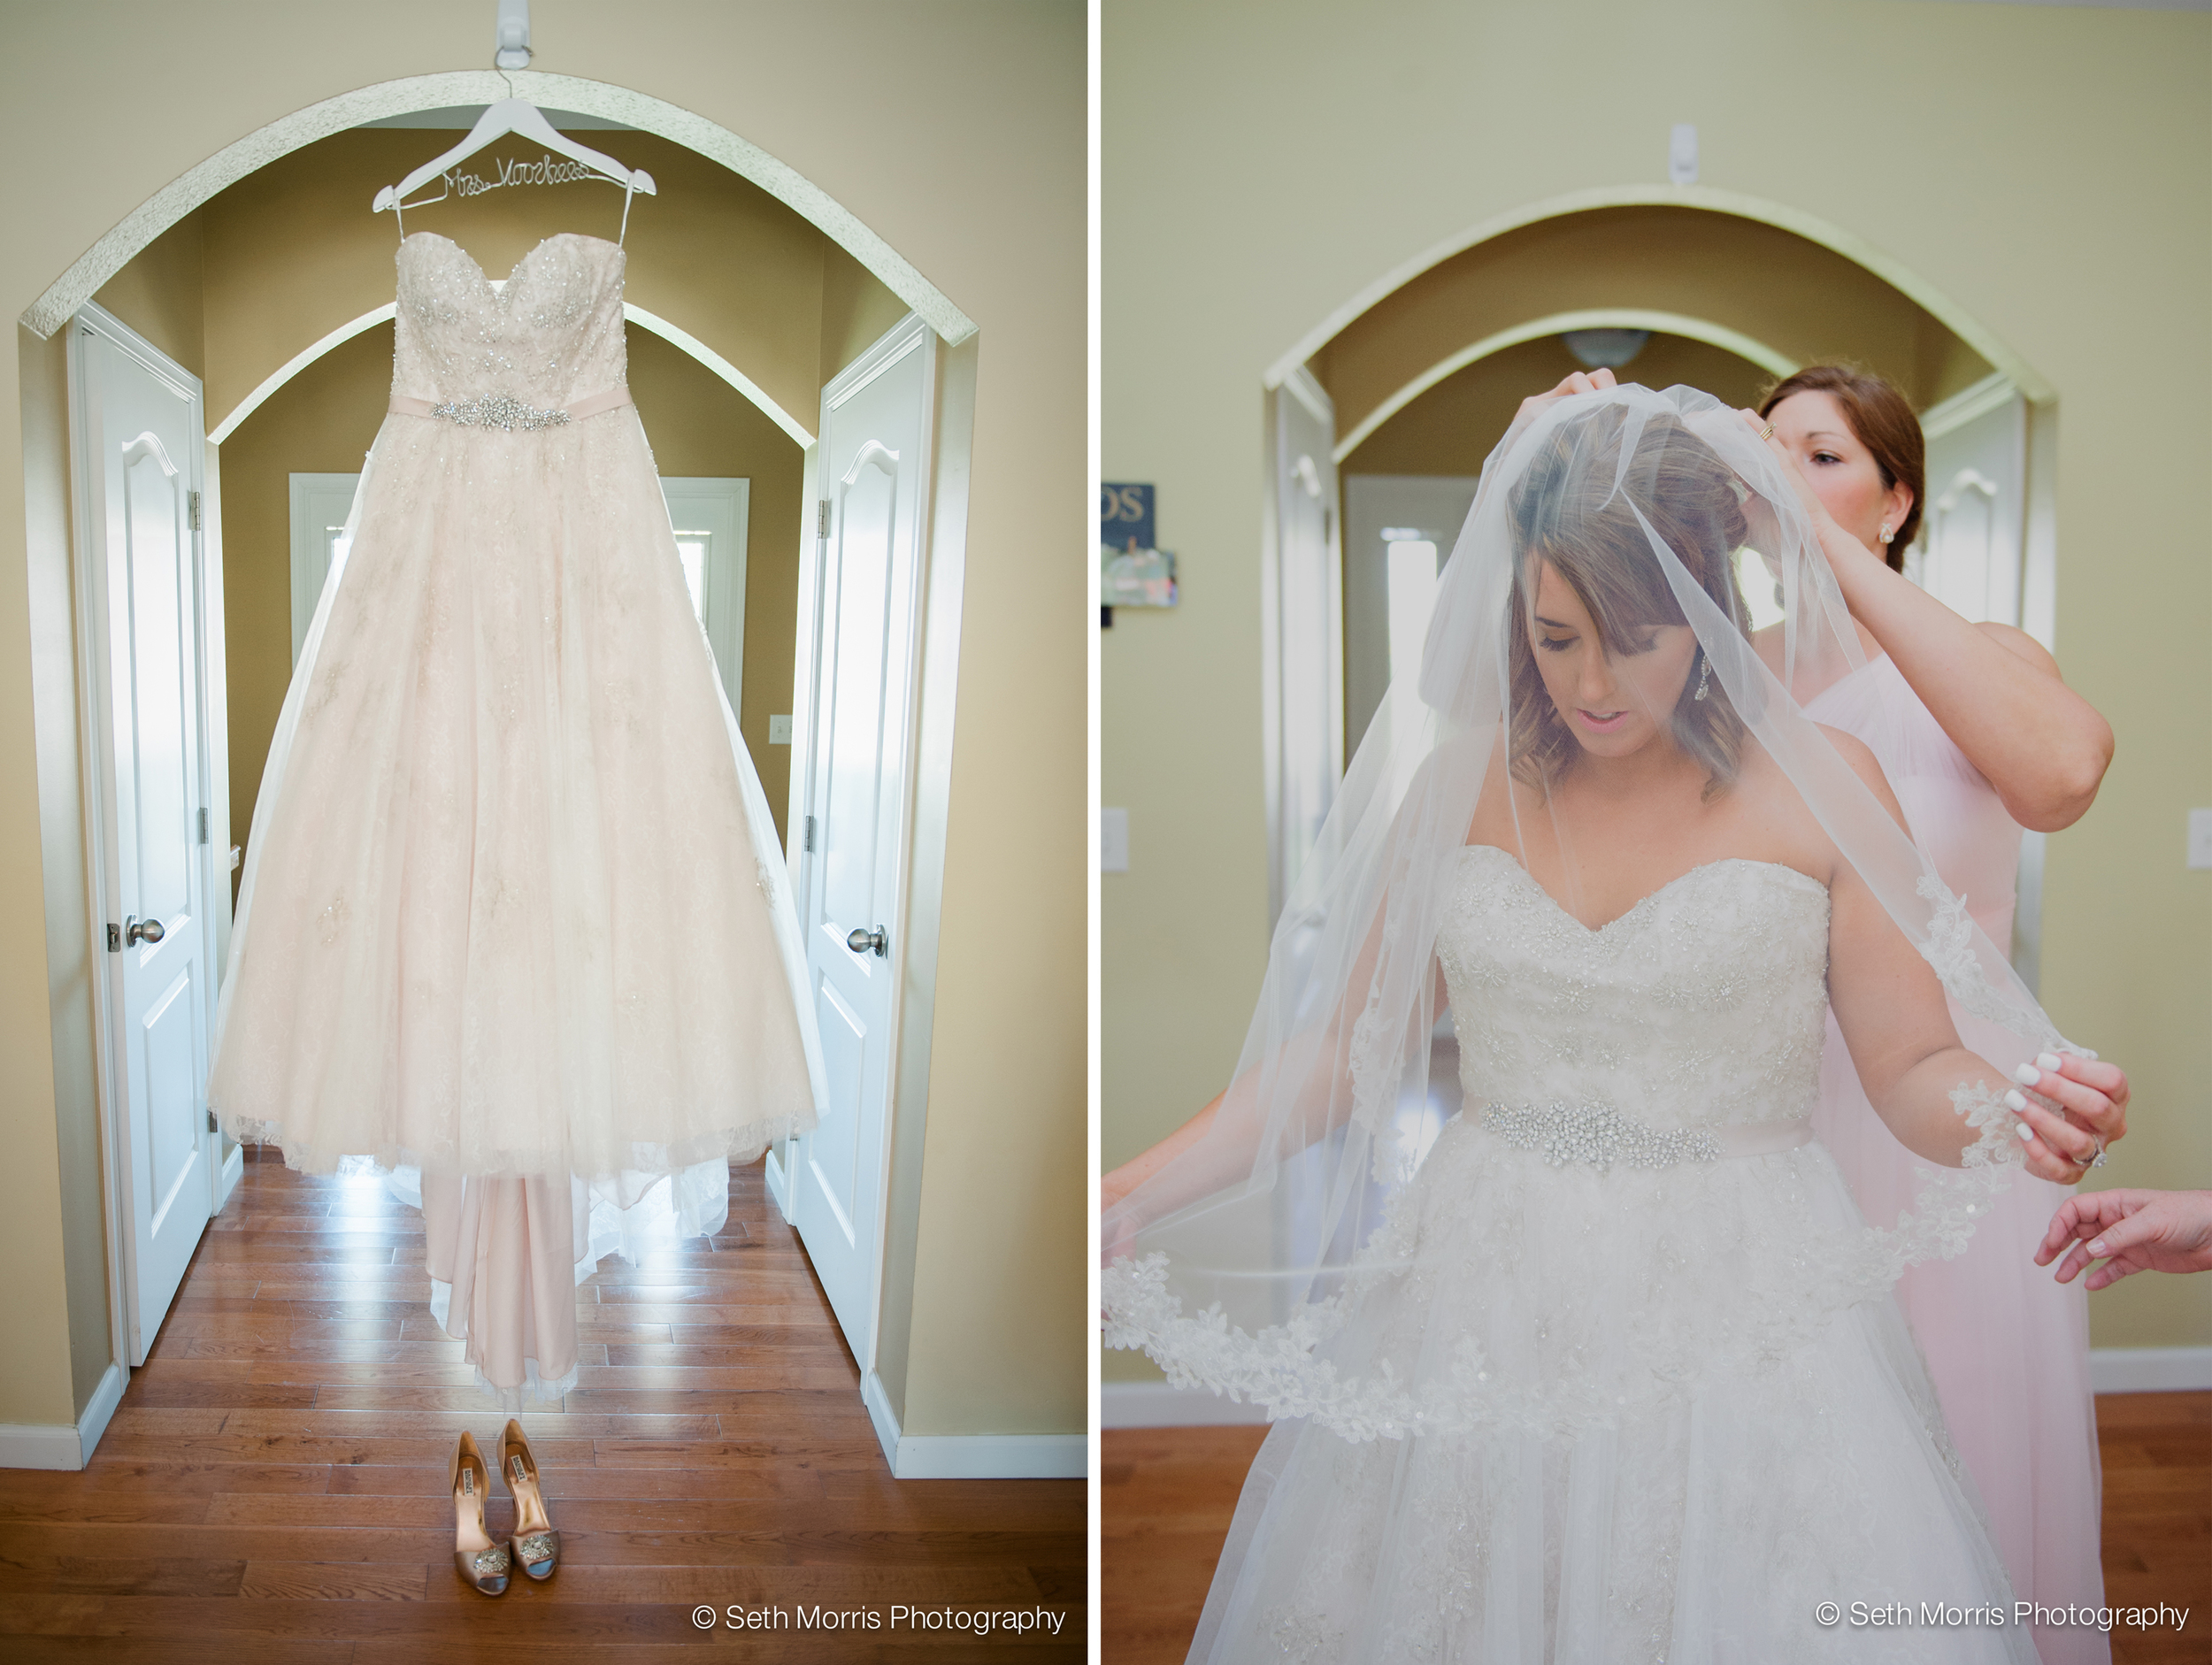 metamora-fields-wedding-photographer-peoria-115.jpg